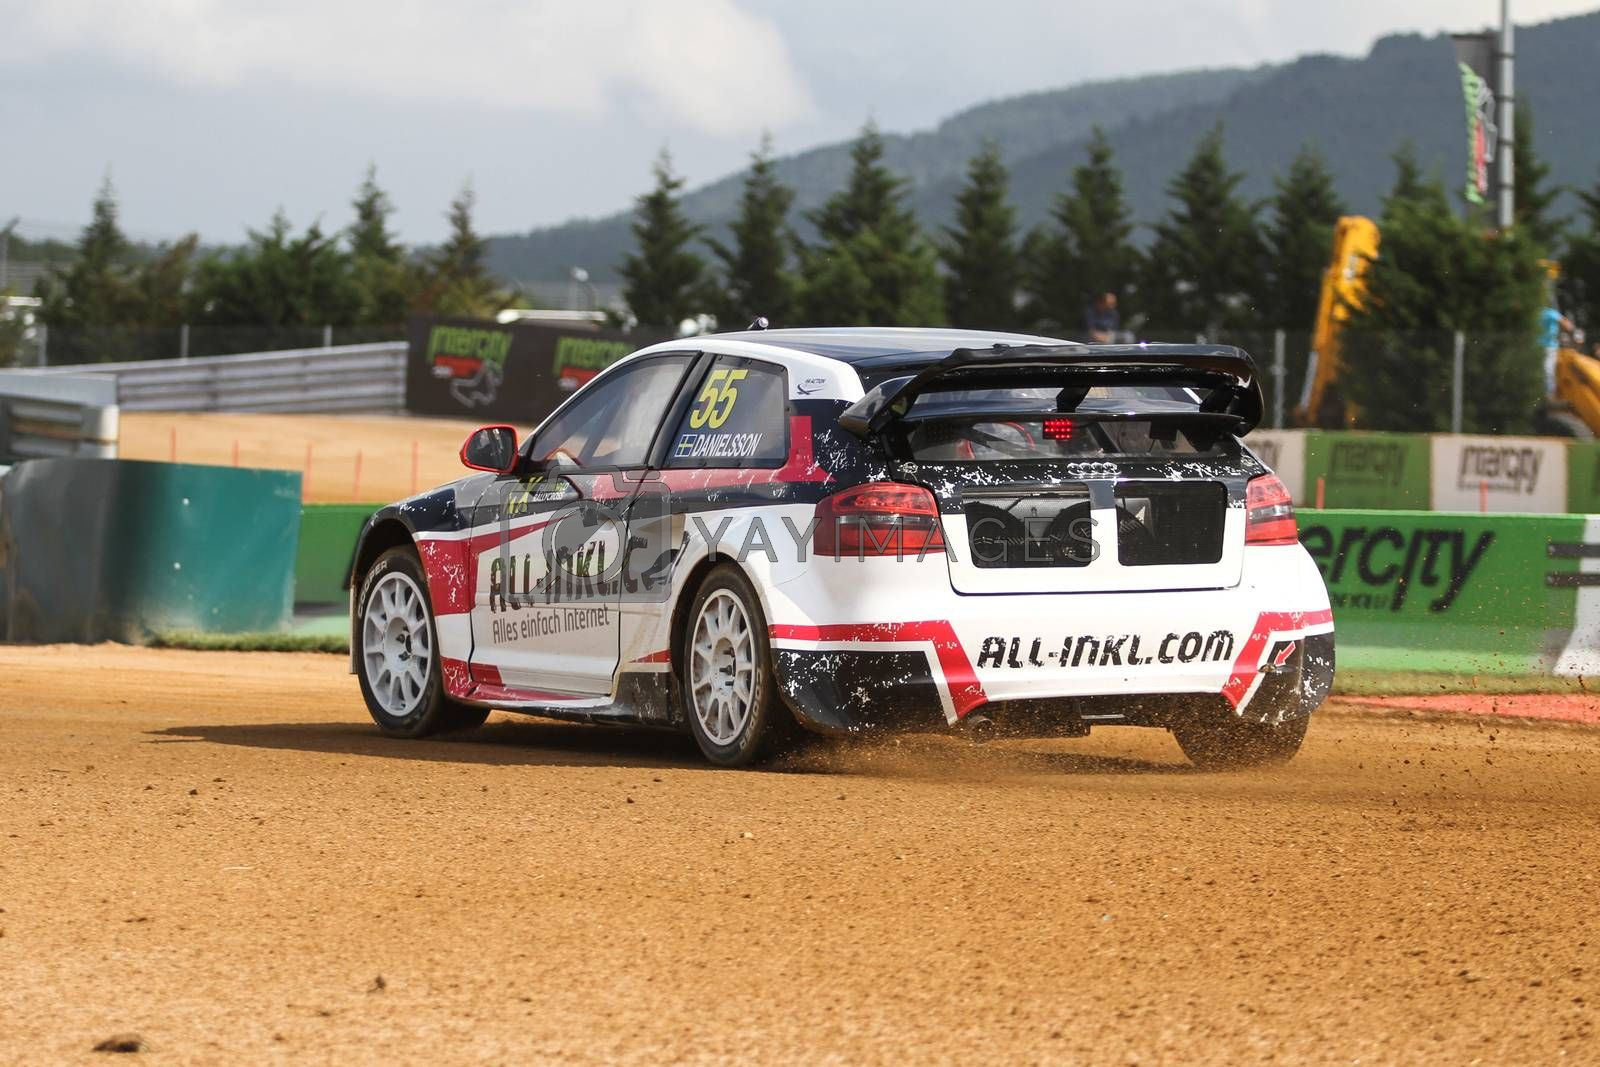 ISTANBUL, TURKEY - OCTOBER 03, 2015: Alx Danielsson drives Audi S3 of all-inkl.com Munnich Motorsport Team in FIA World Rallycross Championship.